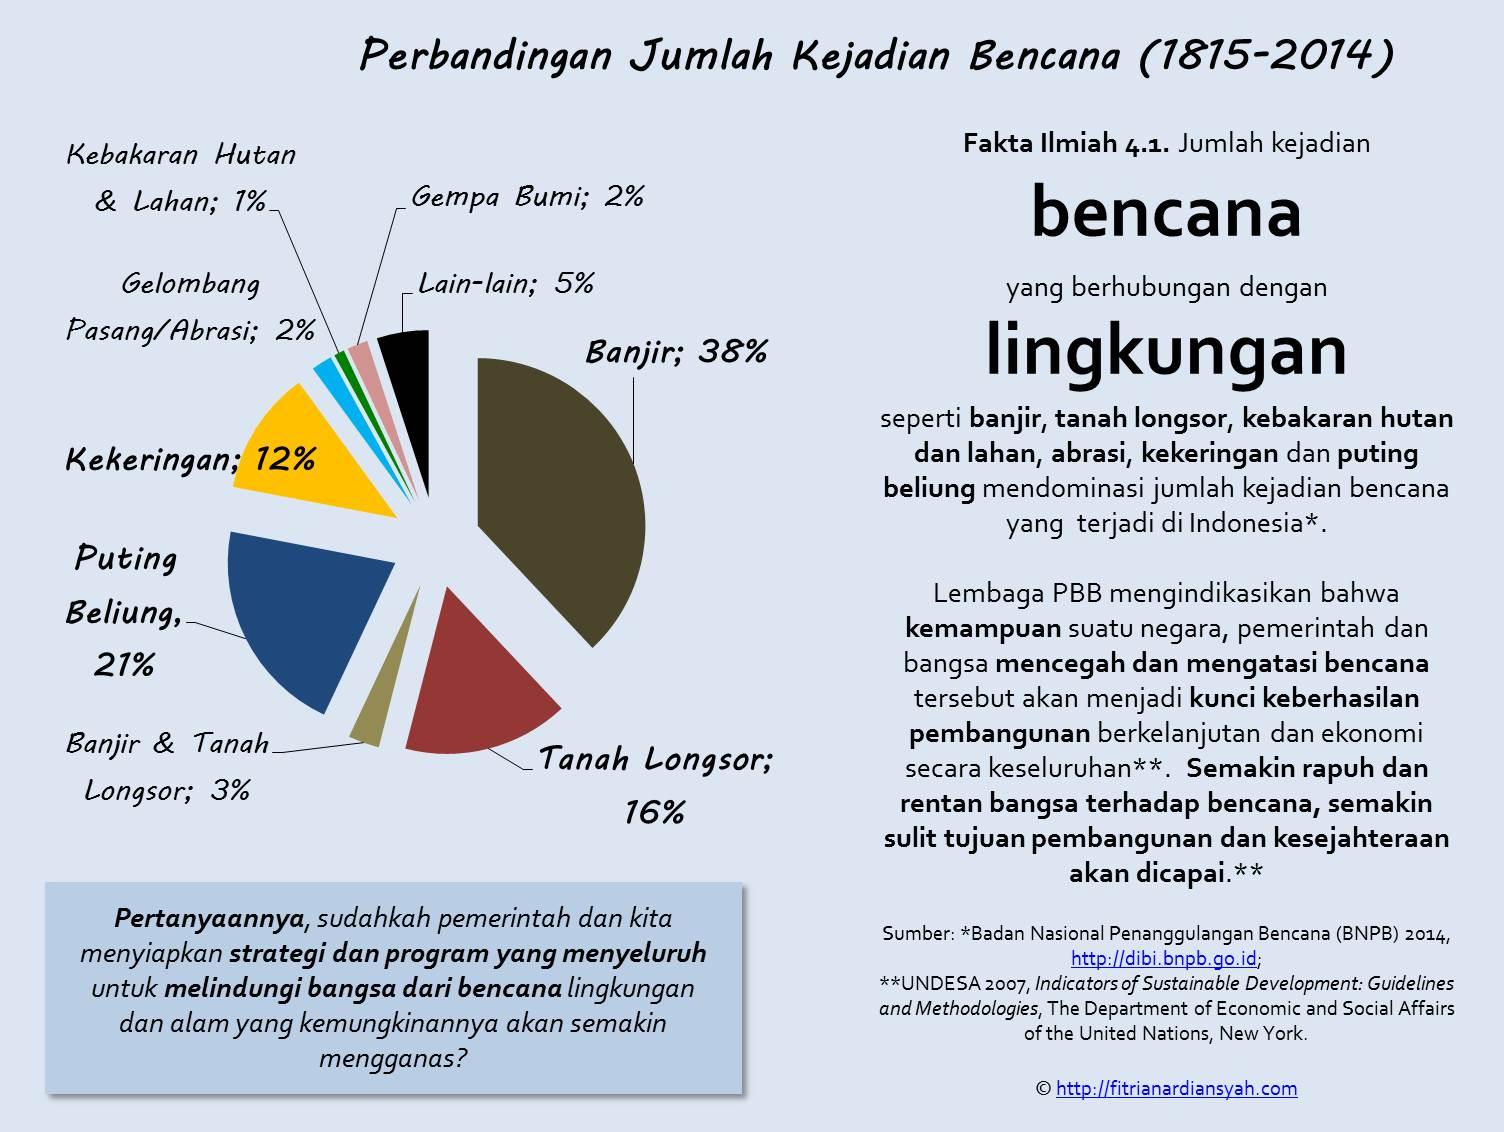 indicators of sustainable development guidelines and methodologies